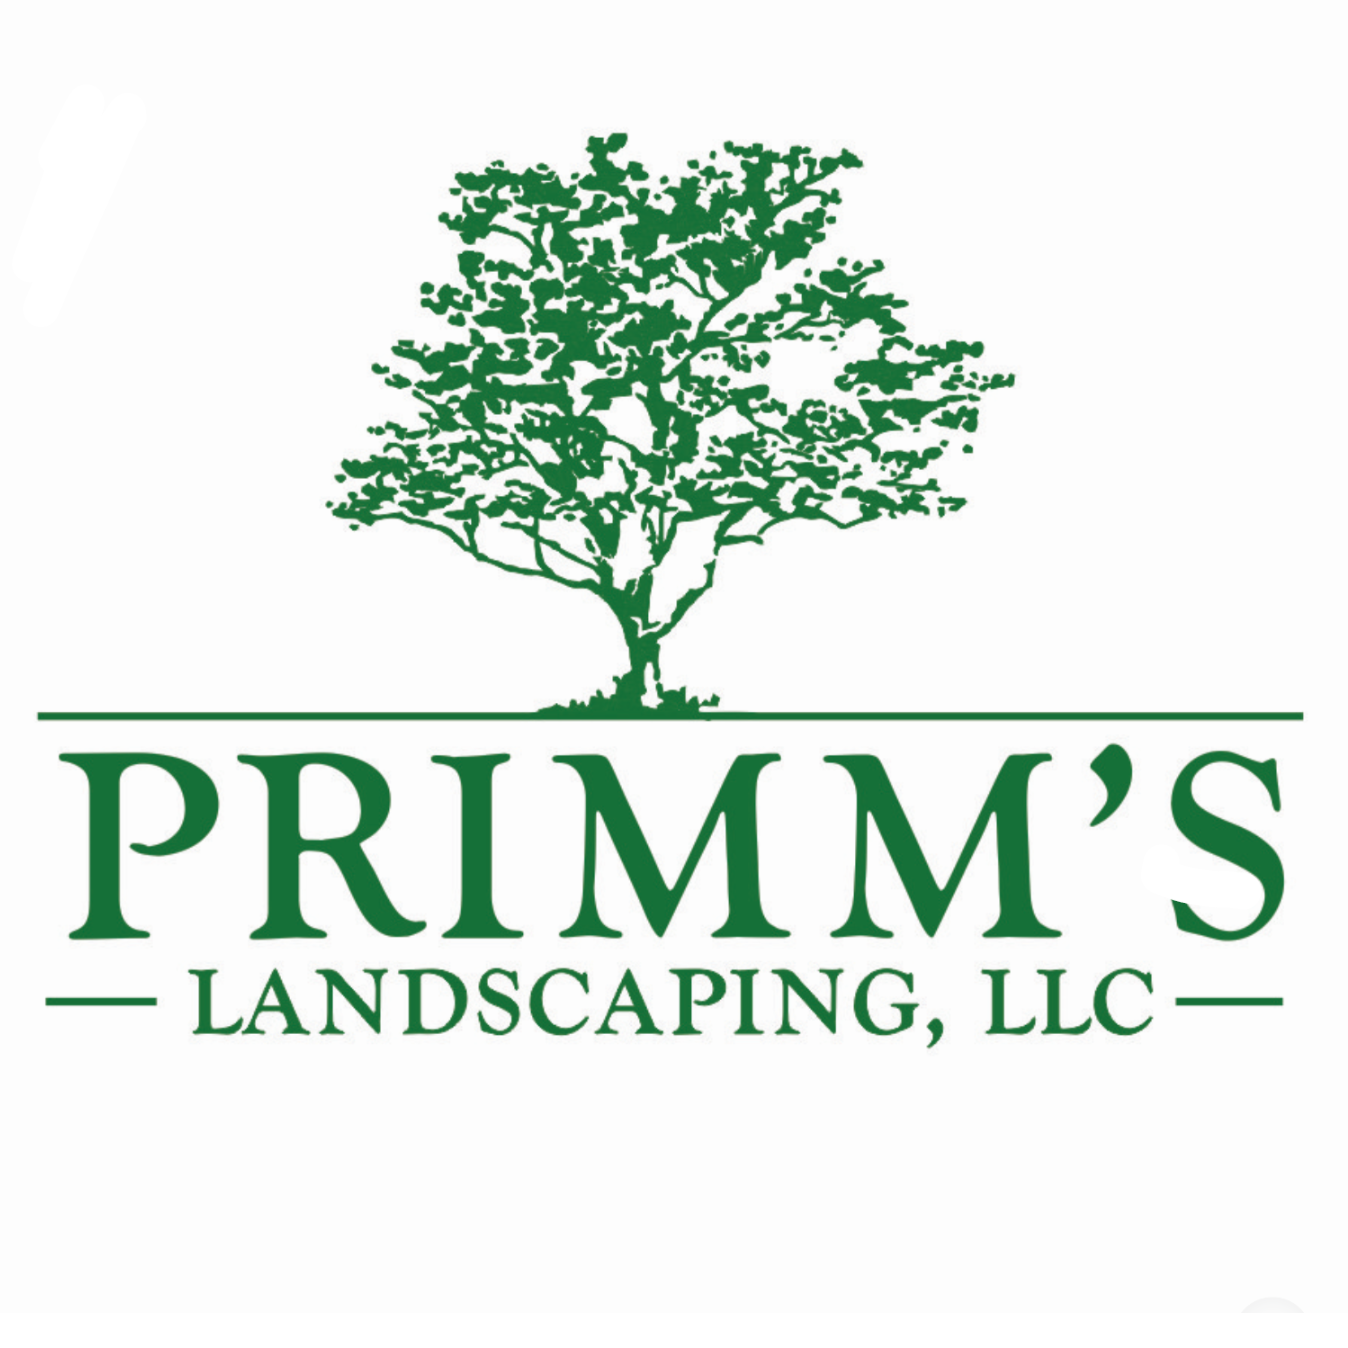 Primm's Landscaping LLC.